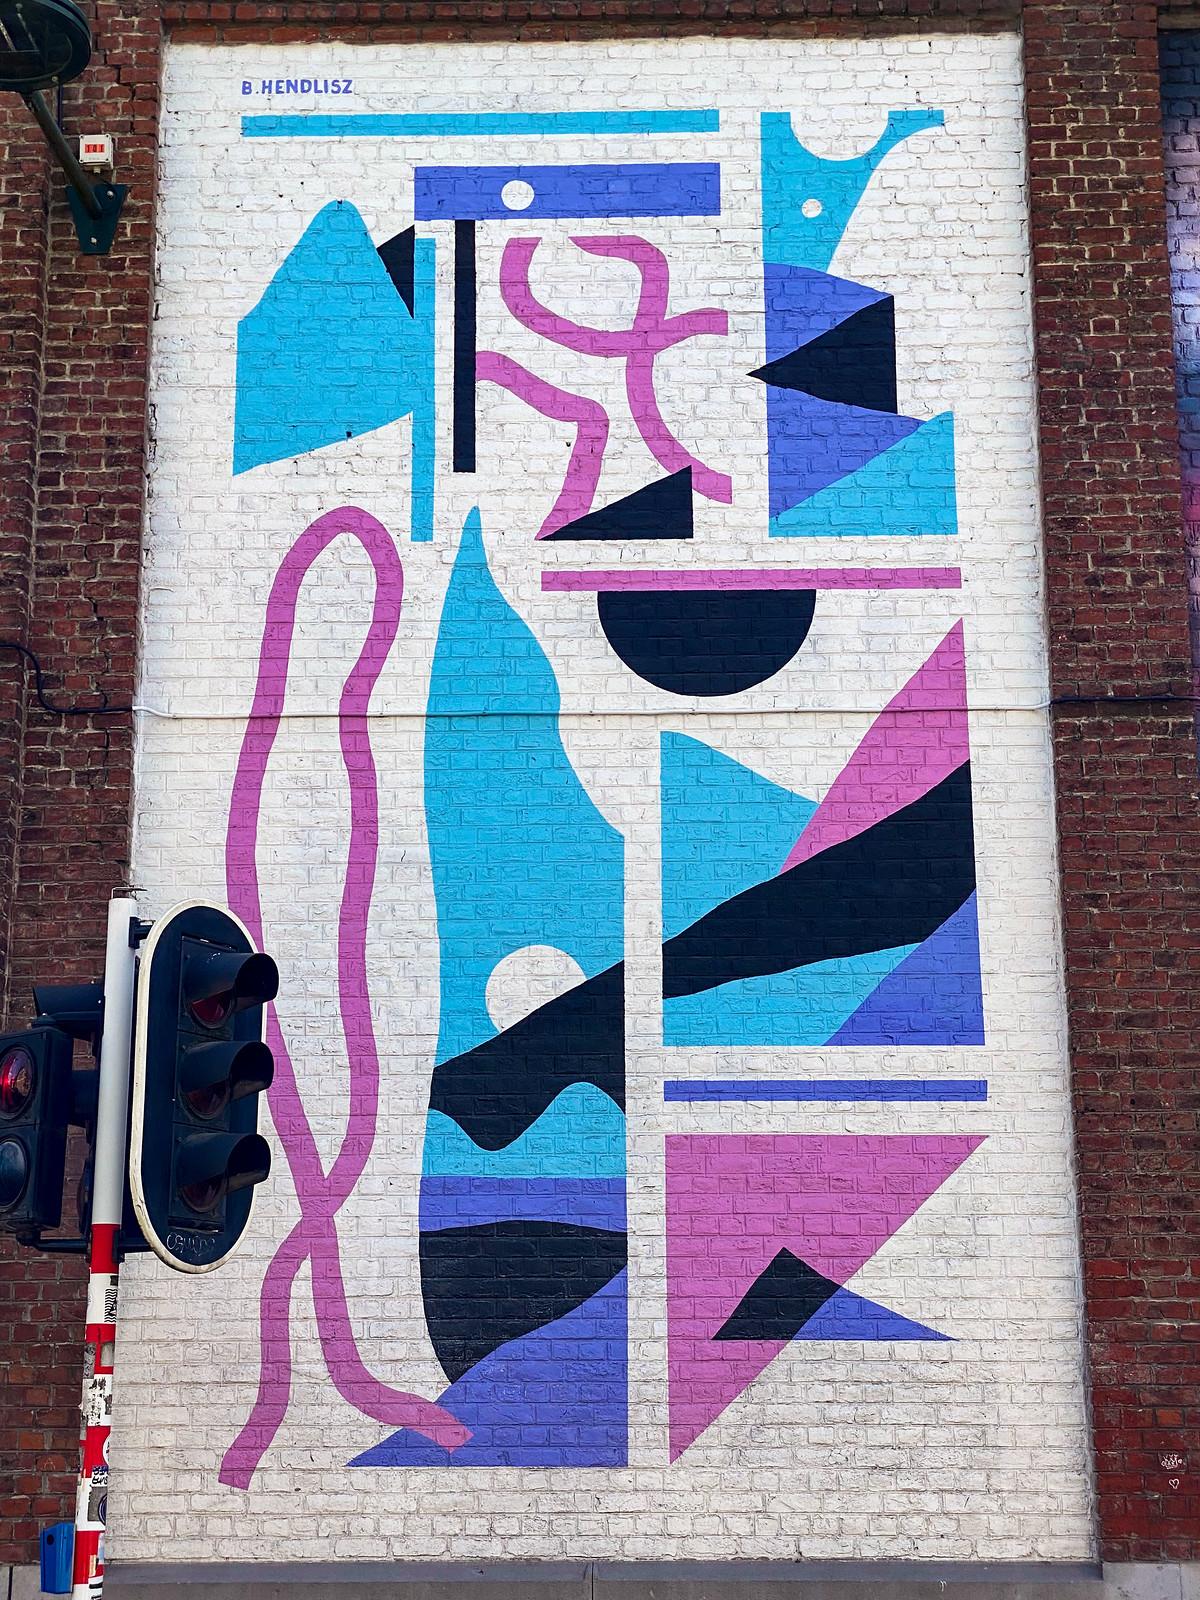 Street art mural by by Hendlisz